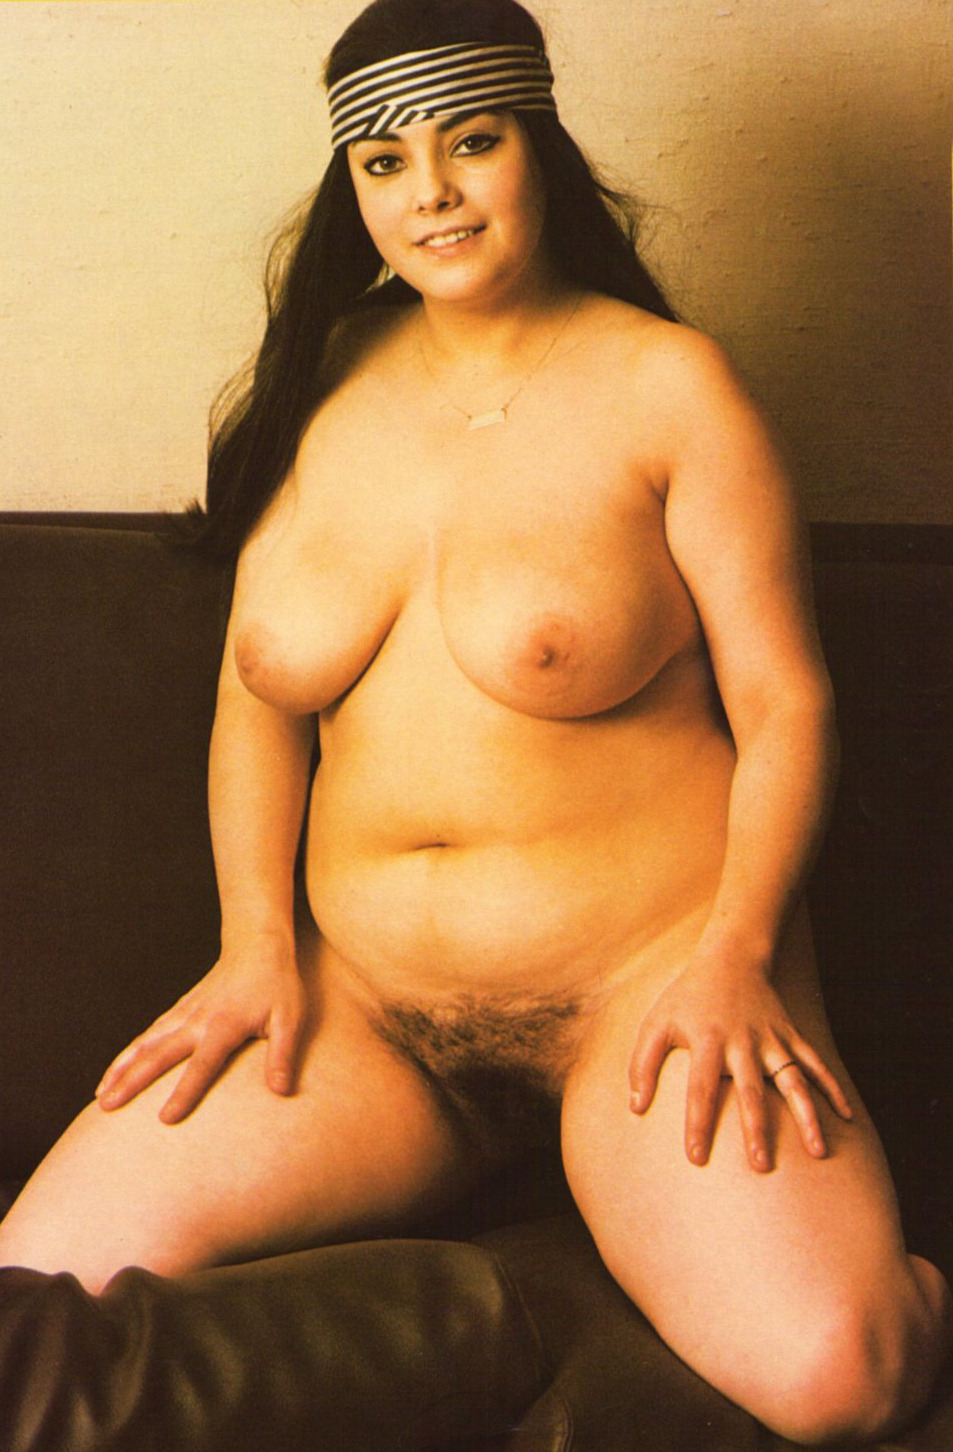 Bbw Photo Porn retro bbw ladies — retro—fucking